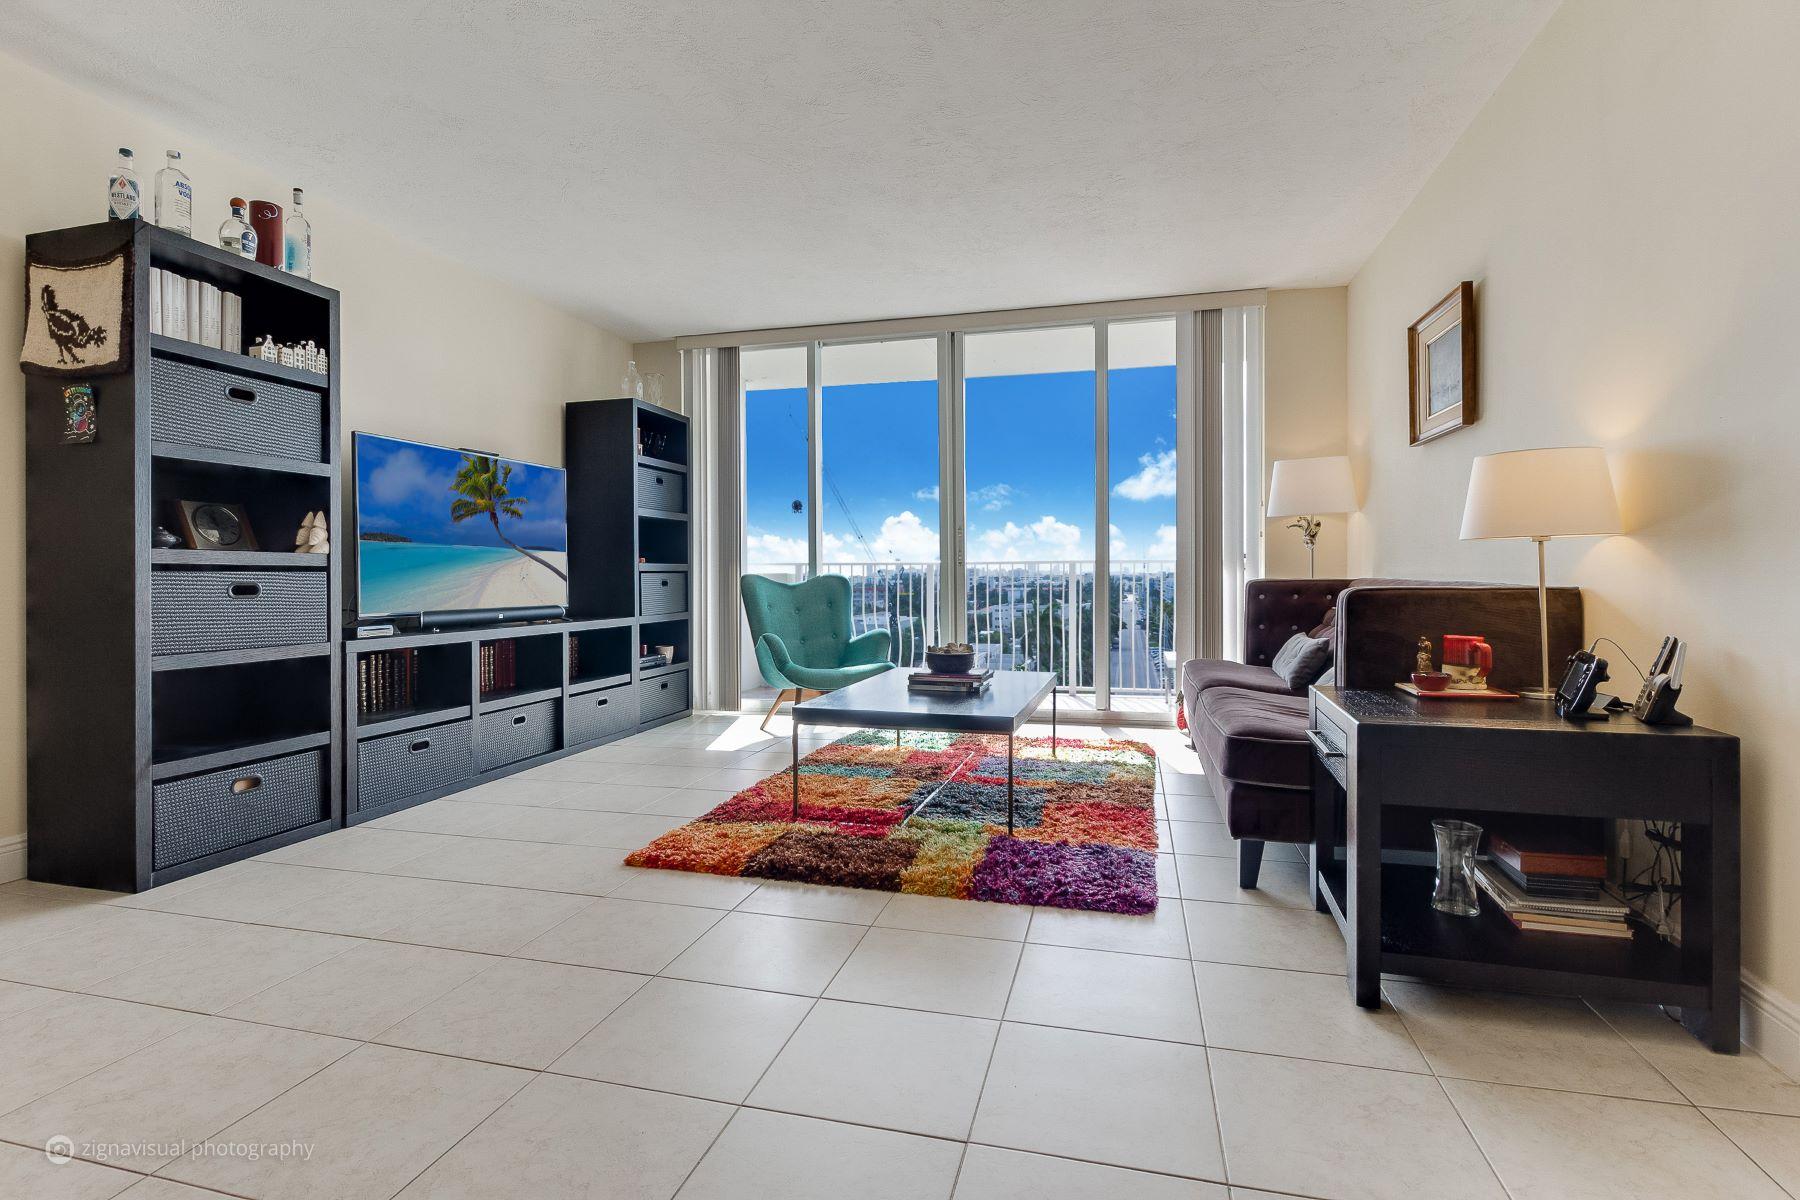 Condomínio para Venda às 10350 W Bay Harbor Dr #9LM 10350 W Bay Harbor Dr 9LM Bay Harbor Islands, Florida, 33154 Estados Unidos